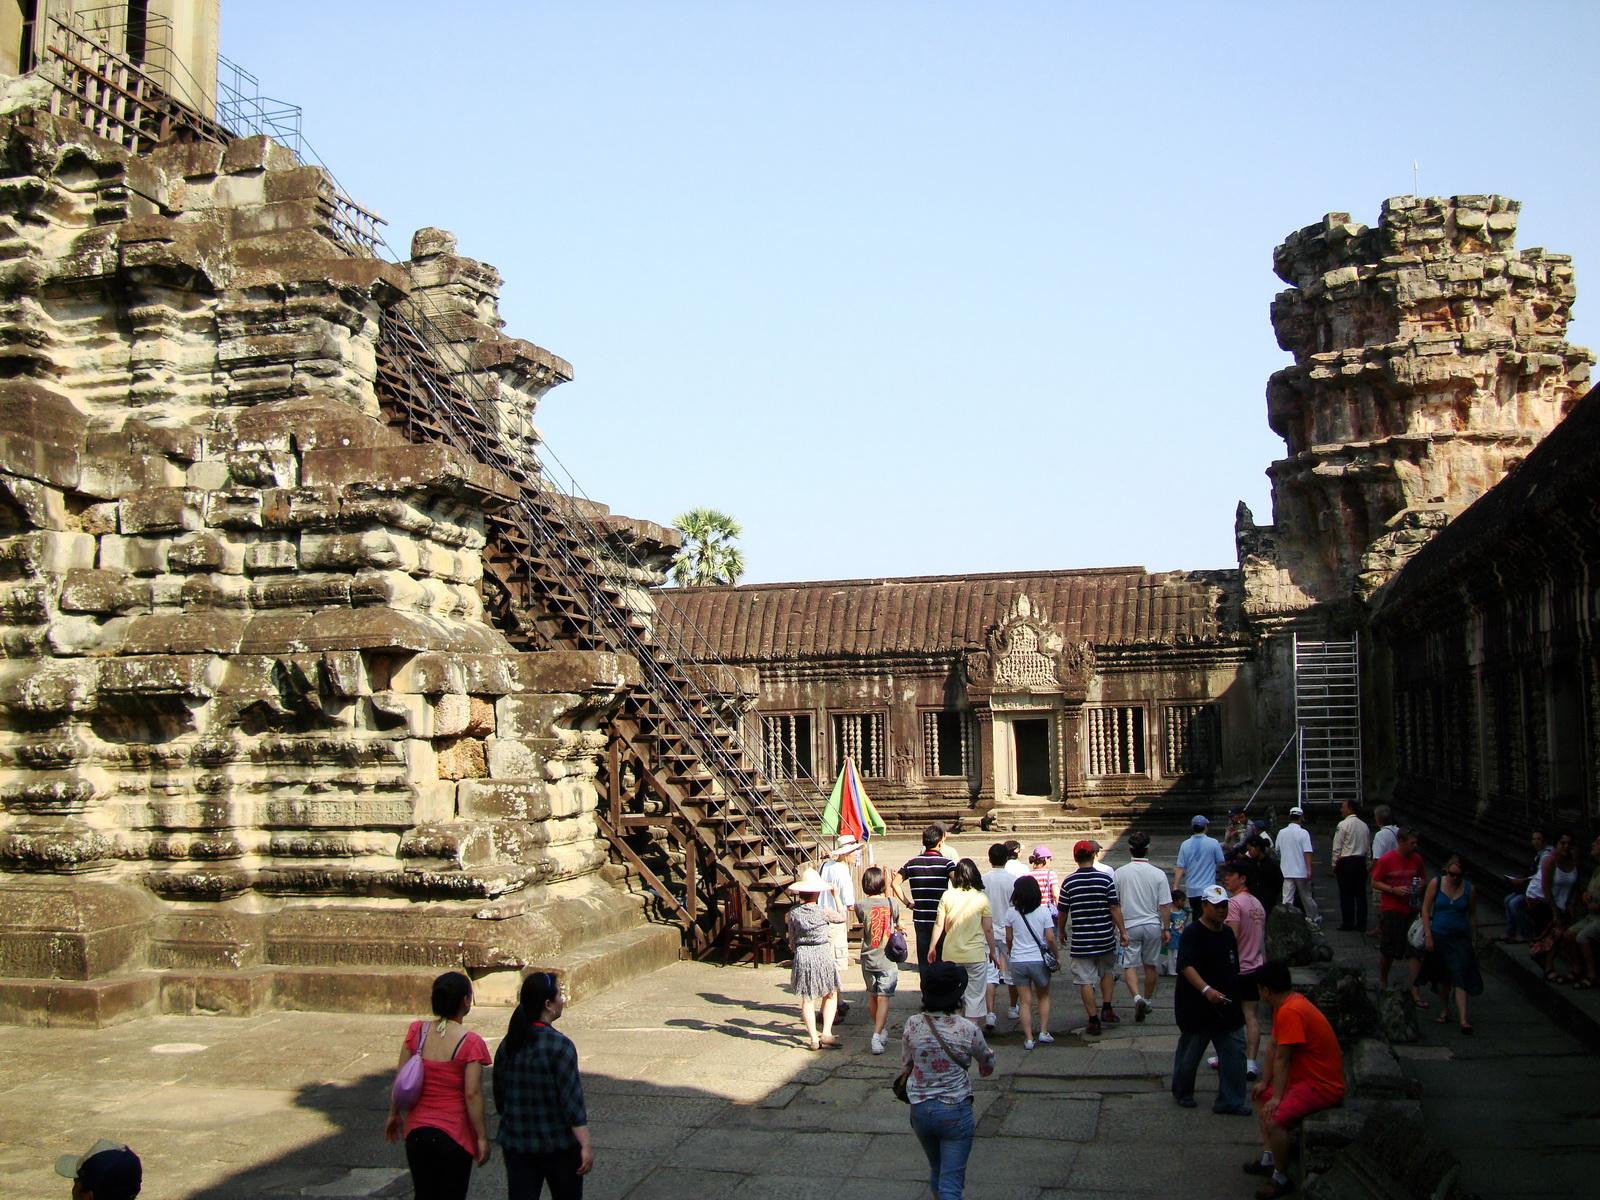 Angkor Wat Khmer architecture inner sanctuary E entrance 10